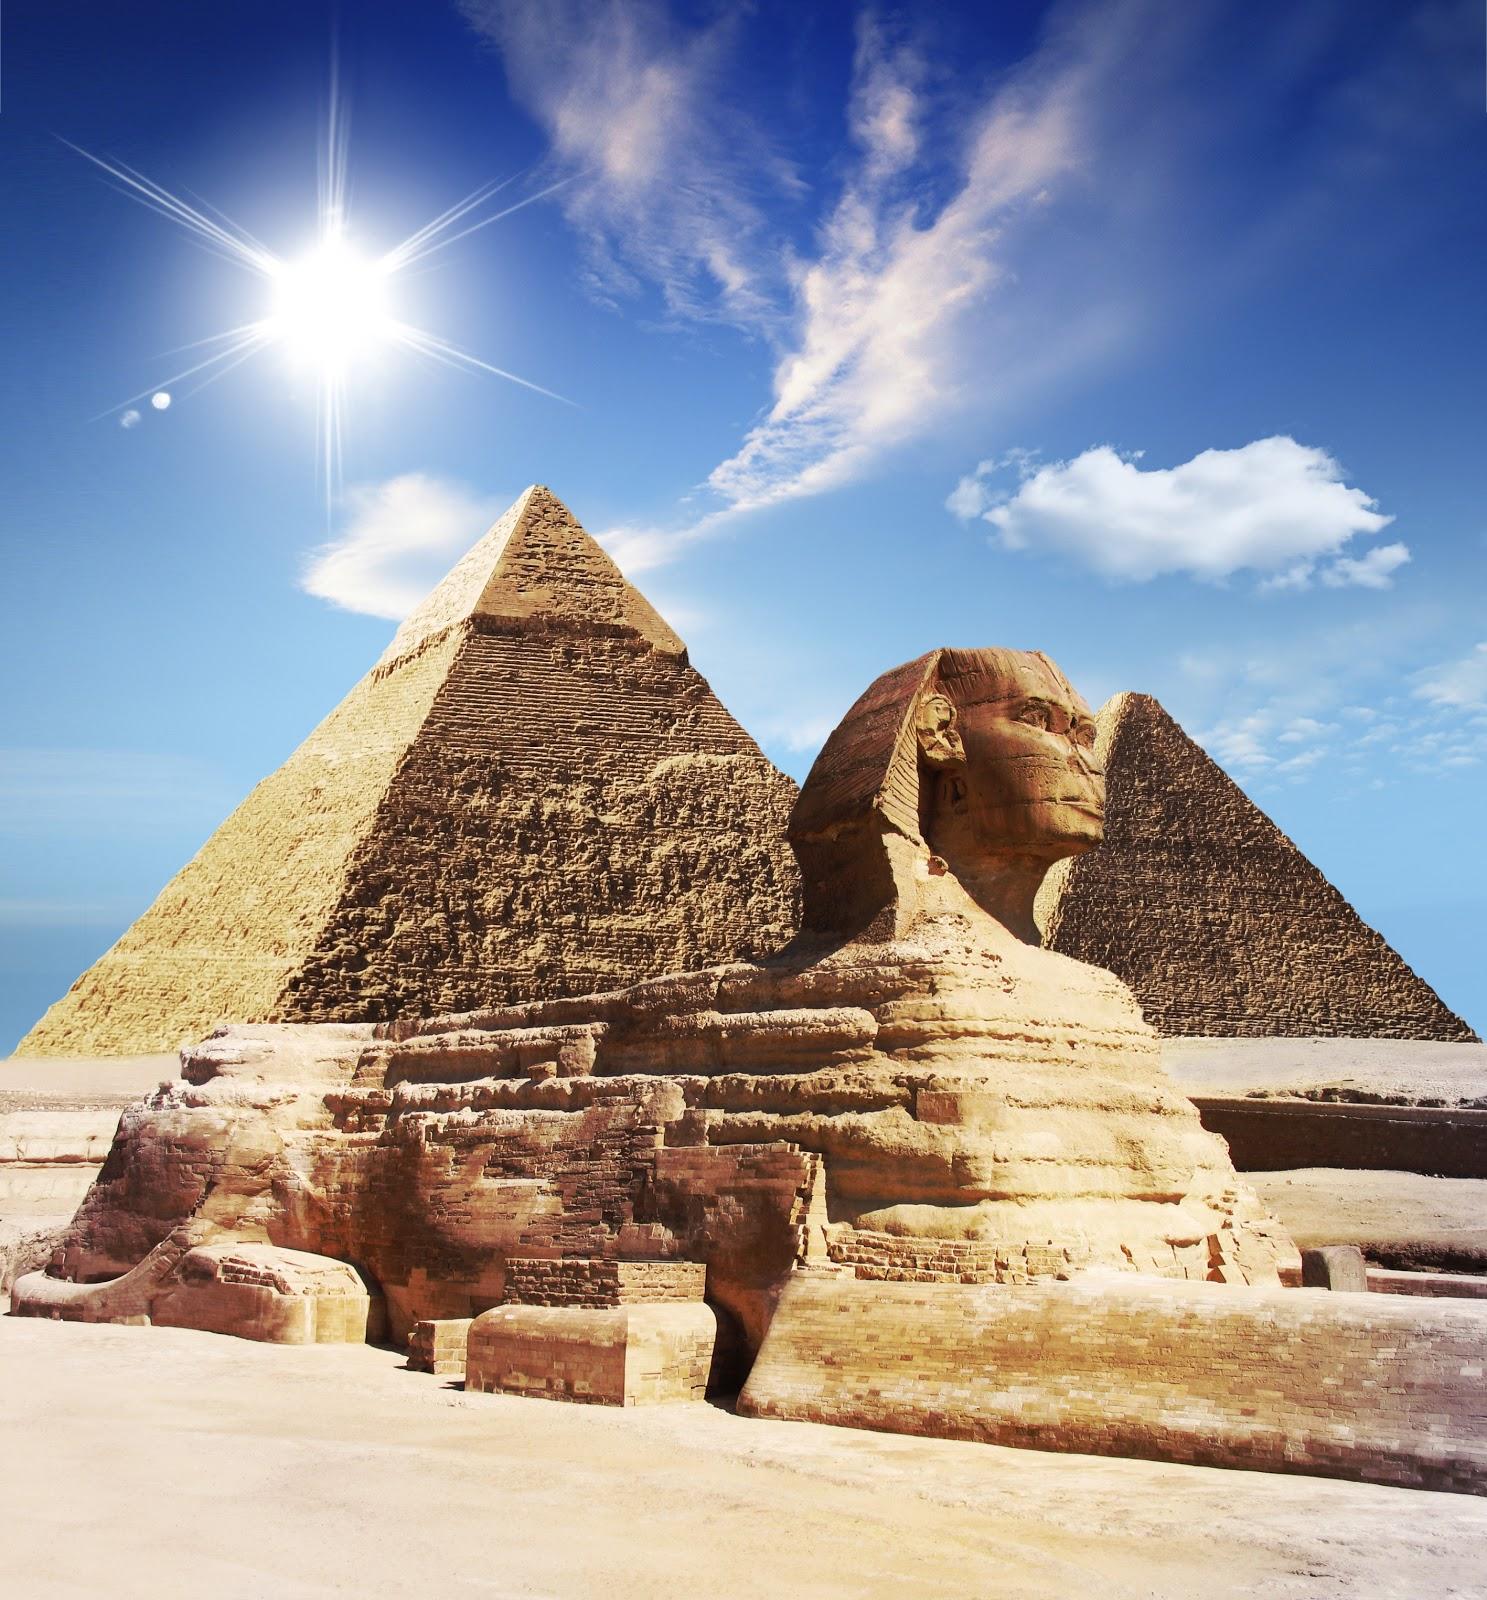 egypt pyramids sphinx inside - photo #28